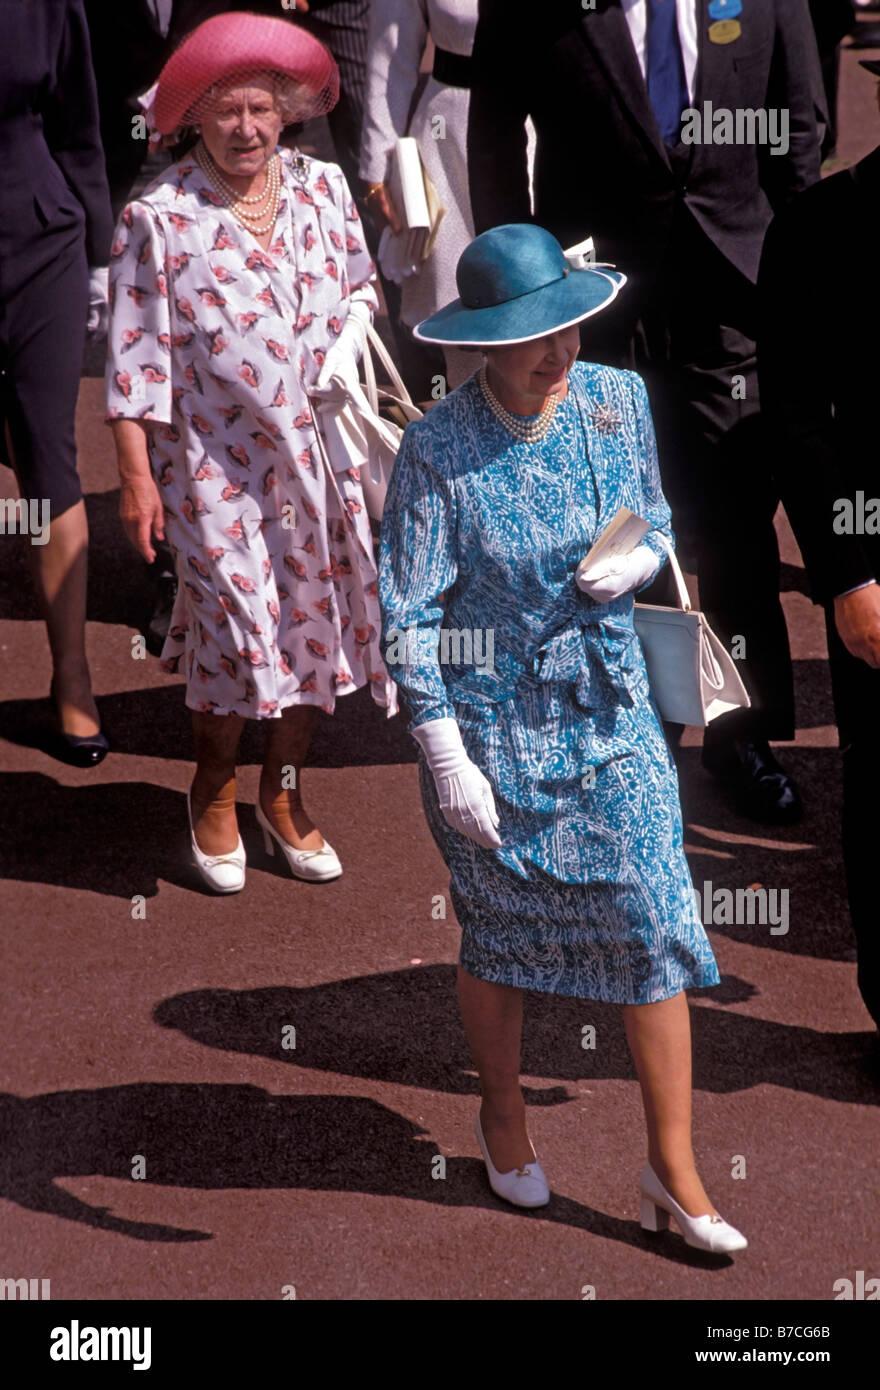 HRH Queen Elizabeth II and HM Queen Elizabeth the Queen Mother at Royal Ascot Races 1989 - Stock Image